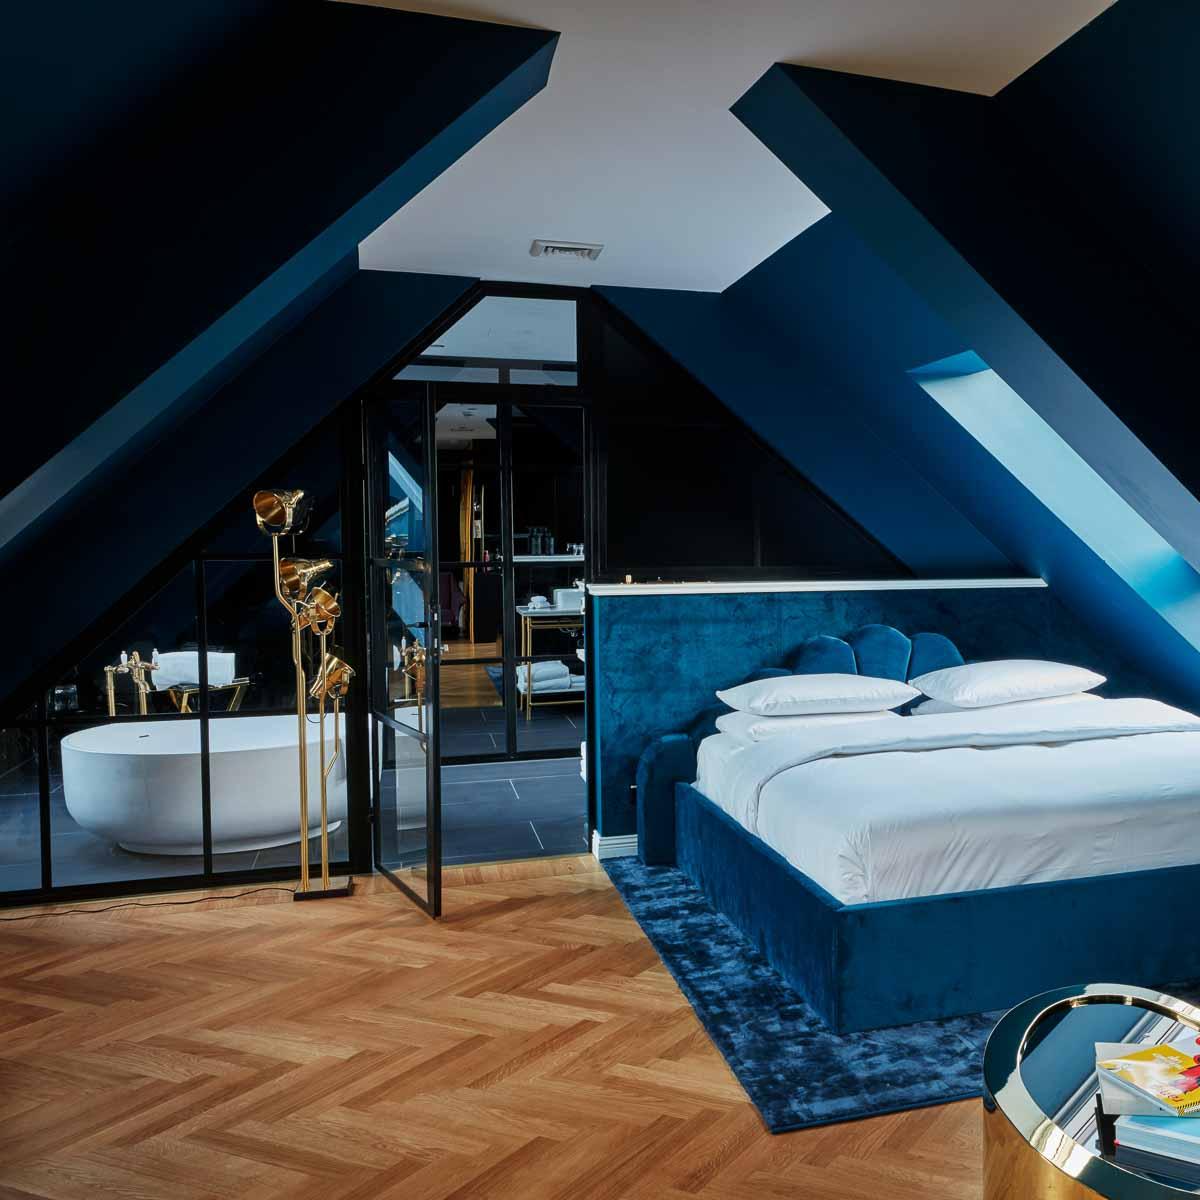 Hotel Provocateur Berlin Wilmersdorf Chrlottenburg-10